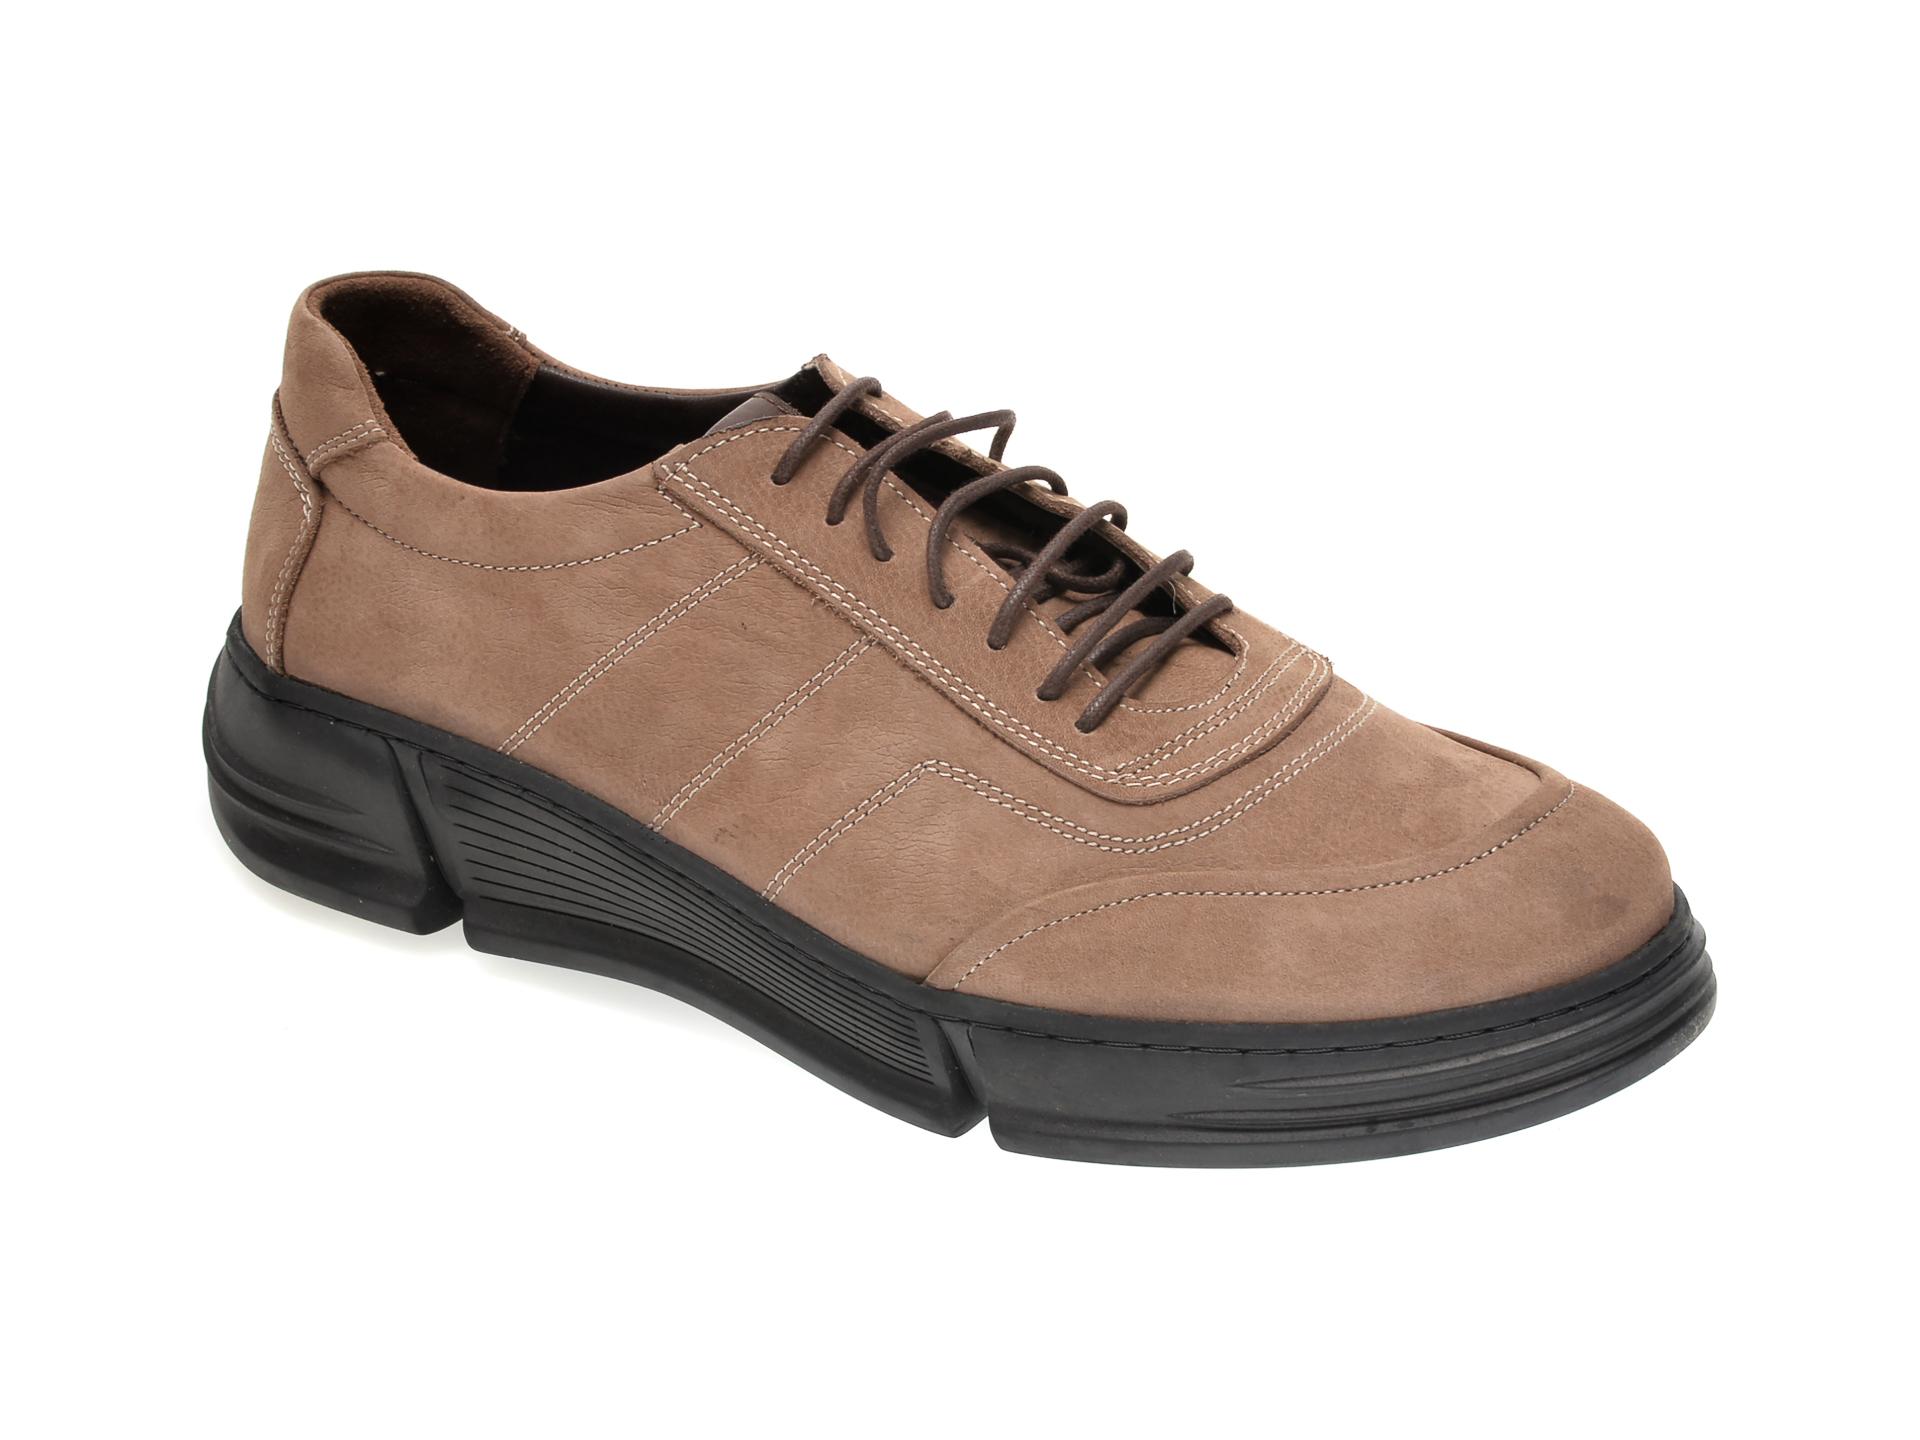 Pantofi OTTER maro, M5726, din nabuc New